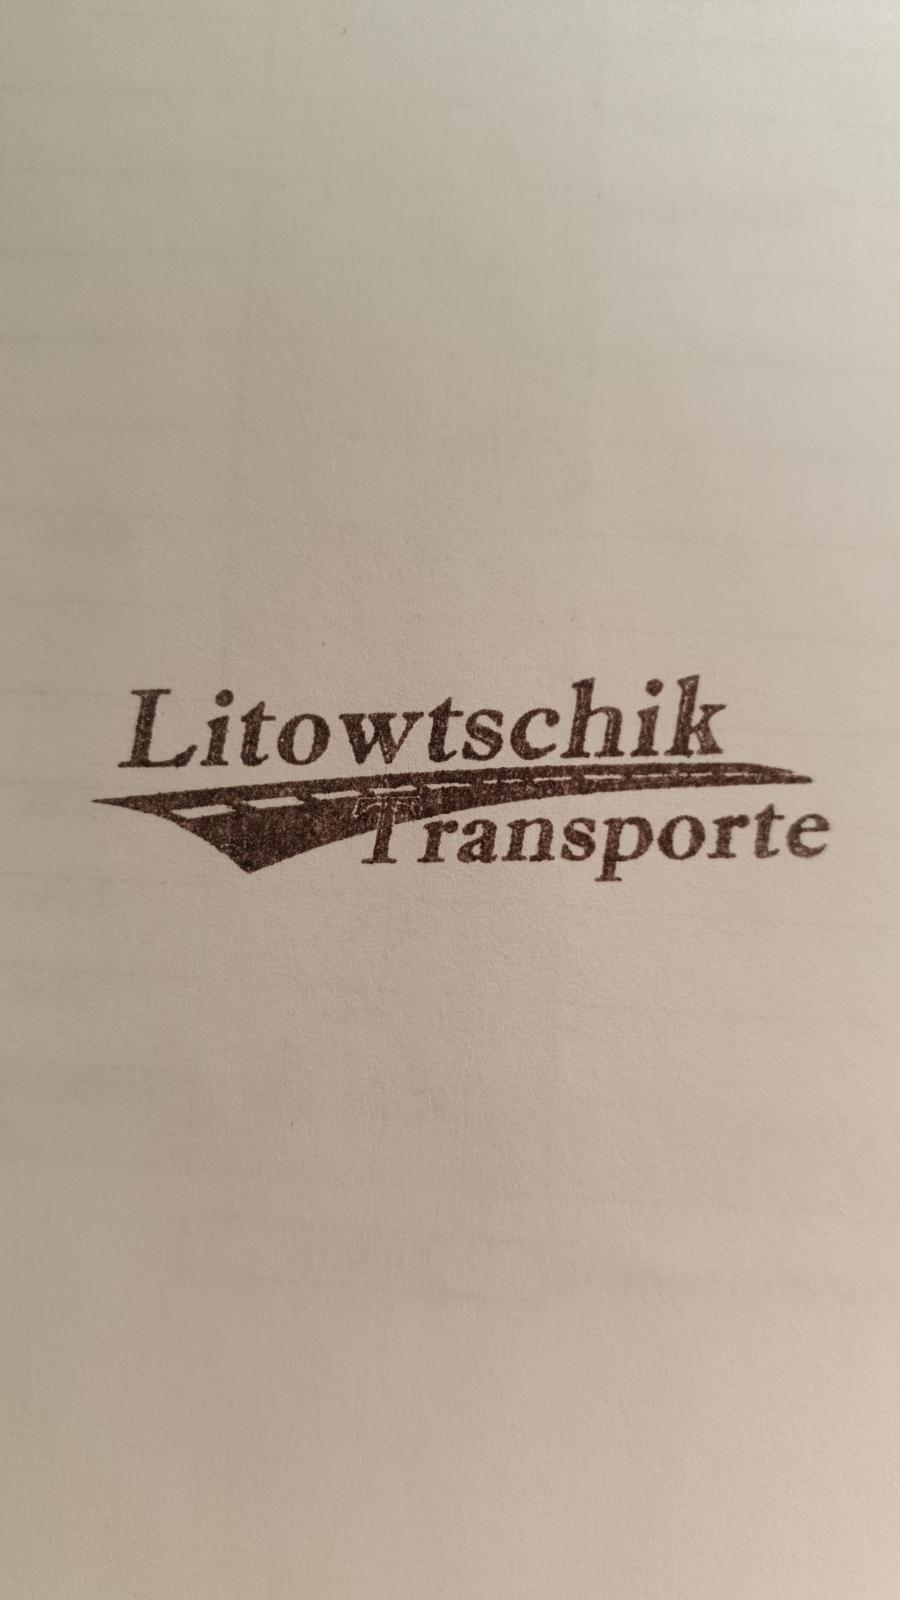 Litowtschik Transporte